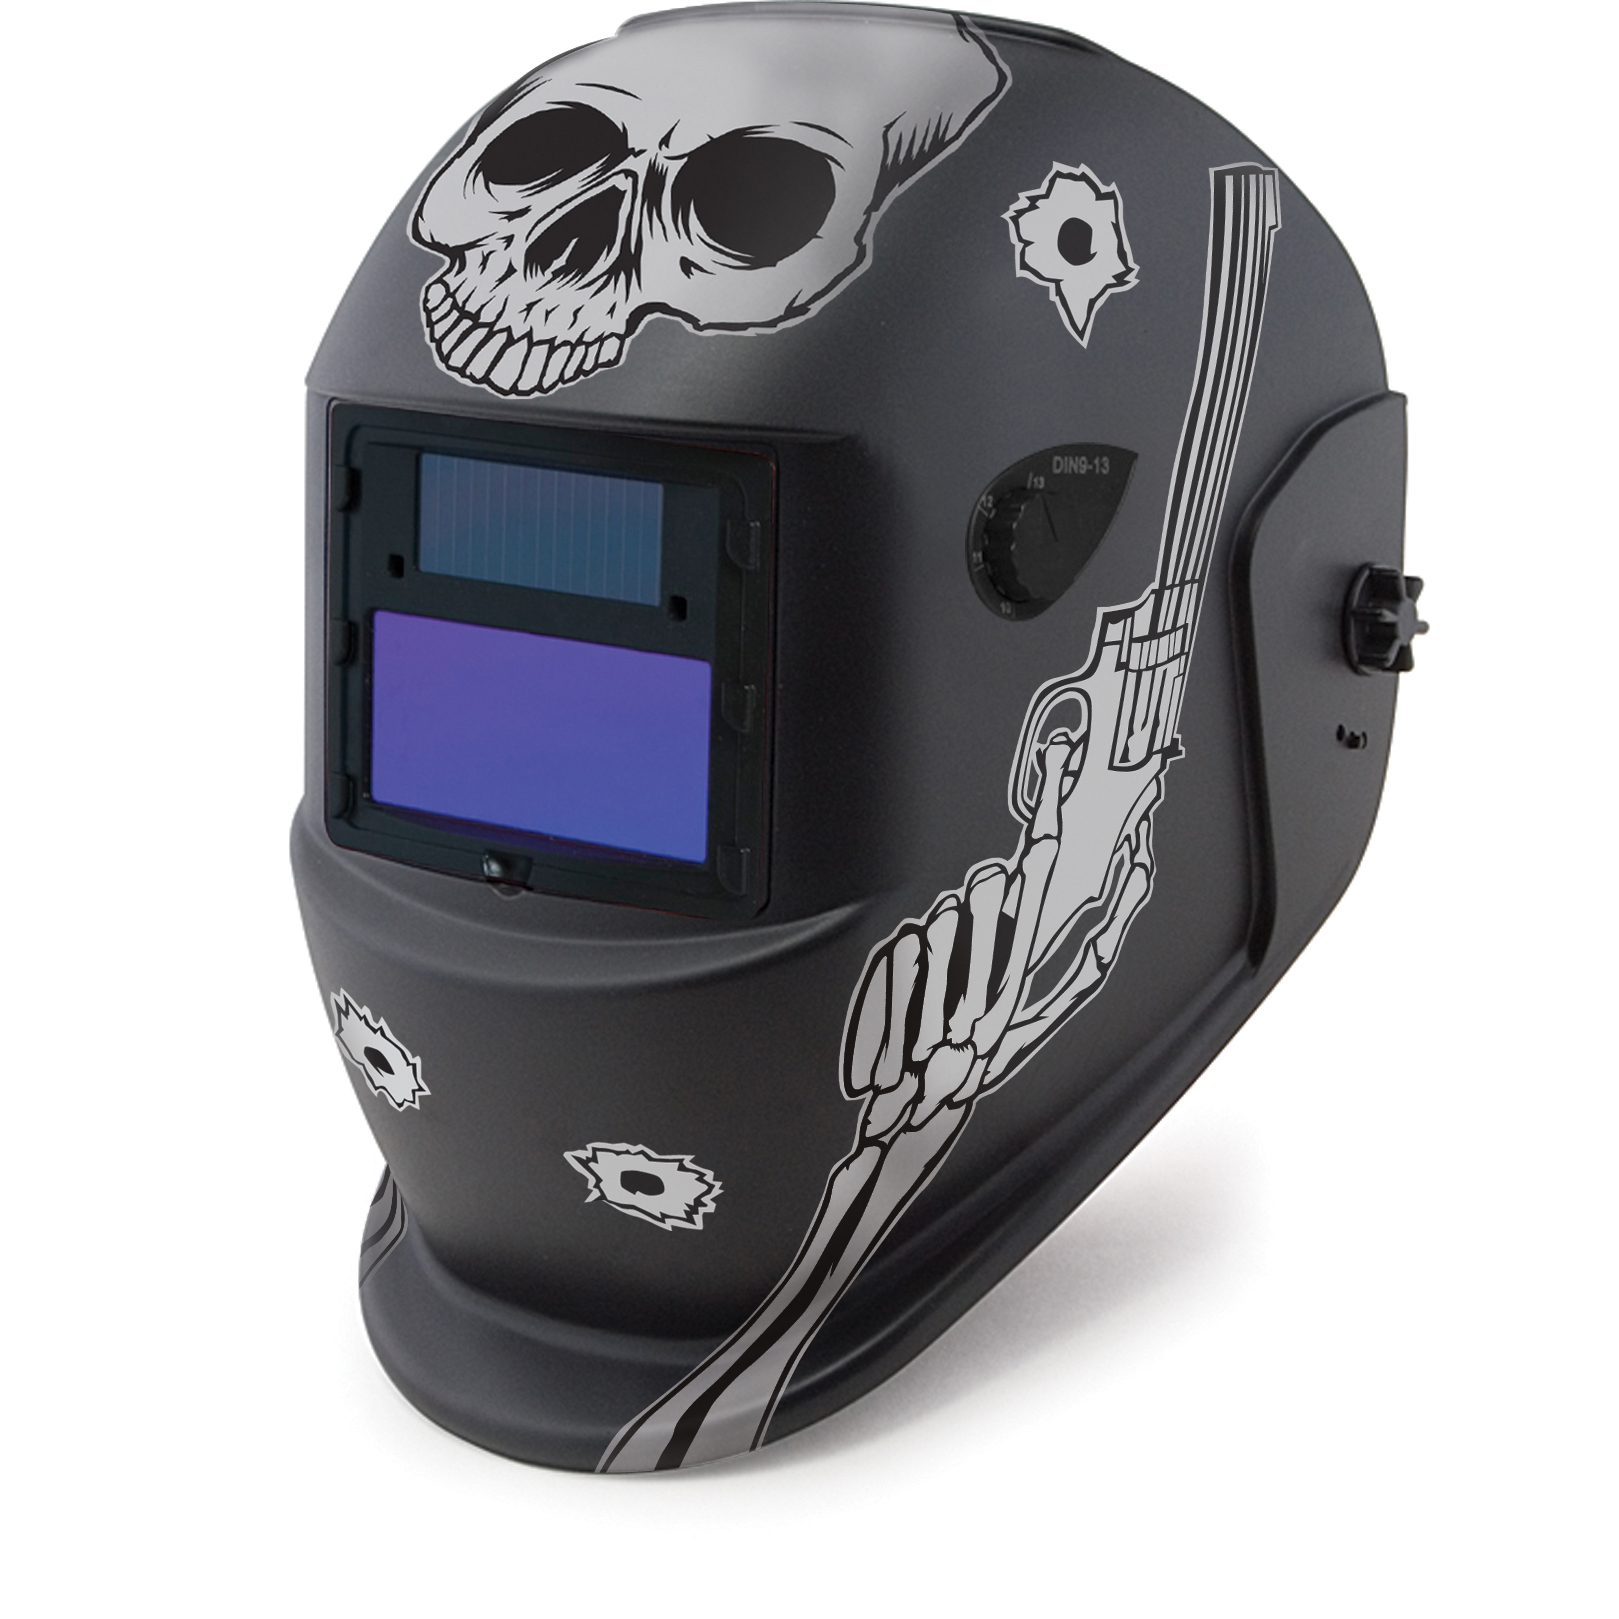 iMeshbean PP Material Solar Auto Darkening Welding Helmet MIG TIG ARC Professional Mask,Gun